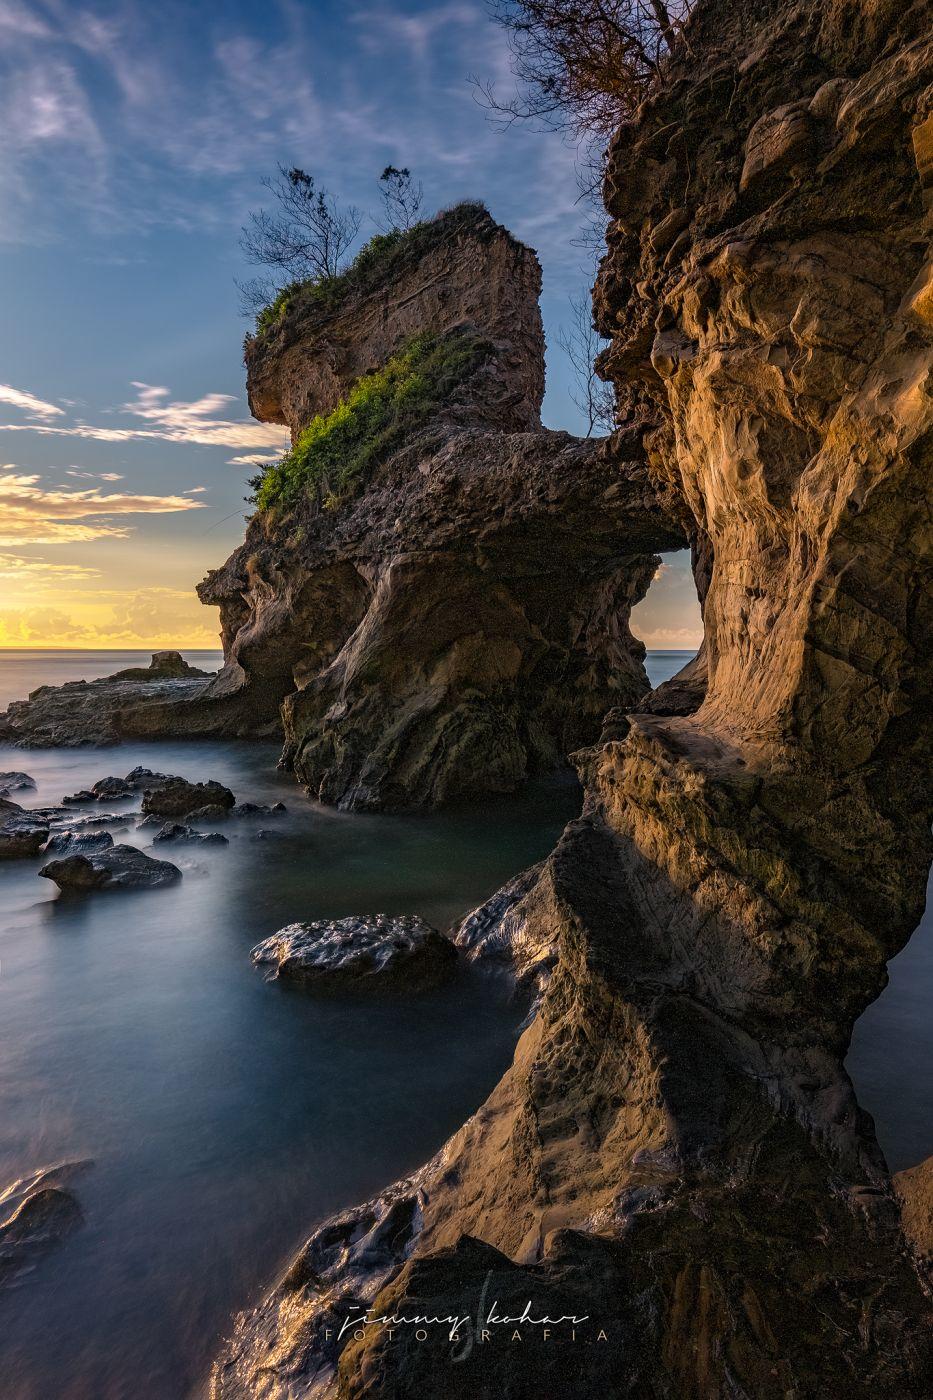 Watuparanu Beach, Indonesia